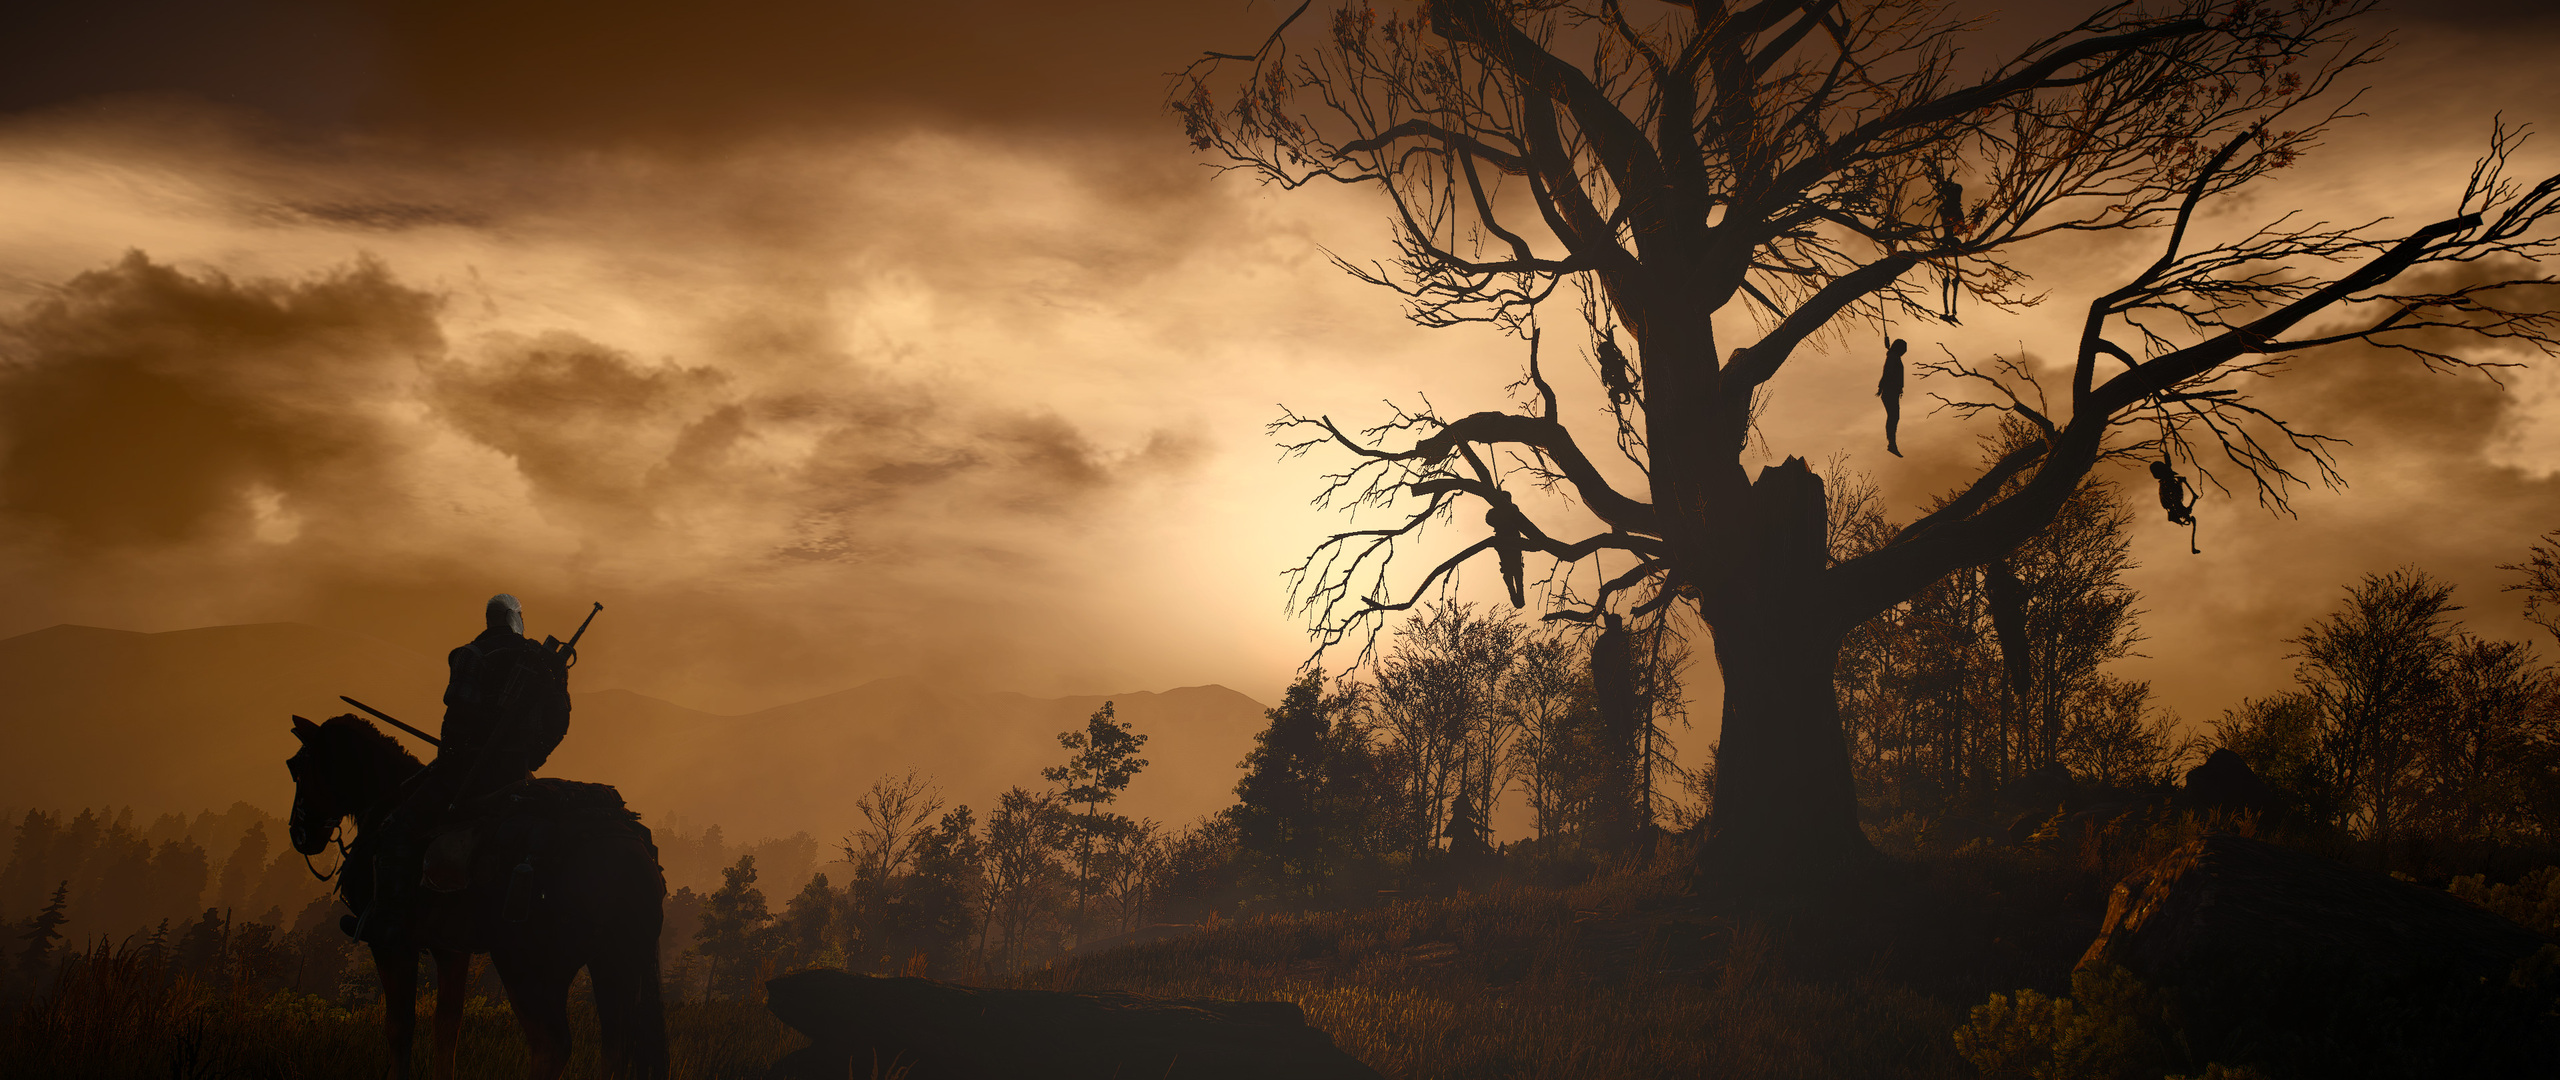 2560x1080 Artwork The Witcher 3 Wild Hunt 2560x1080